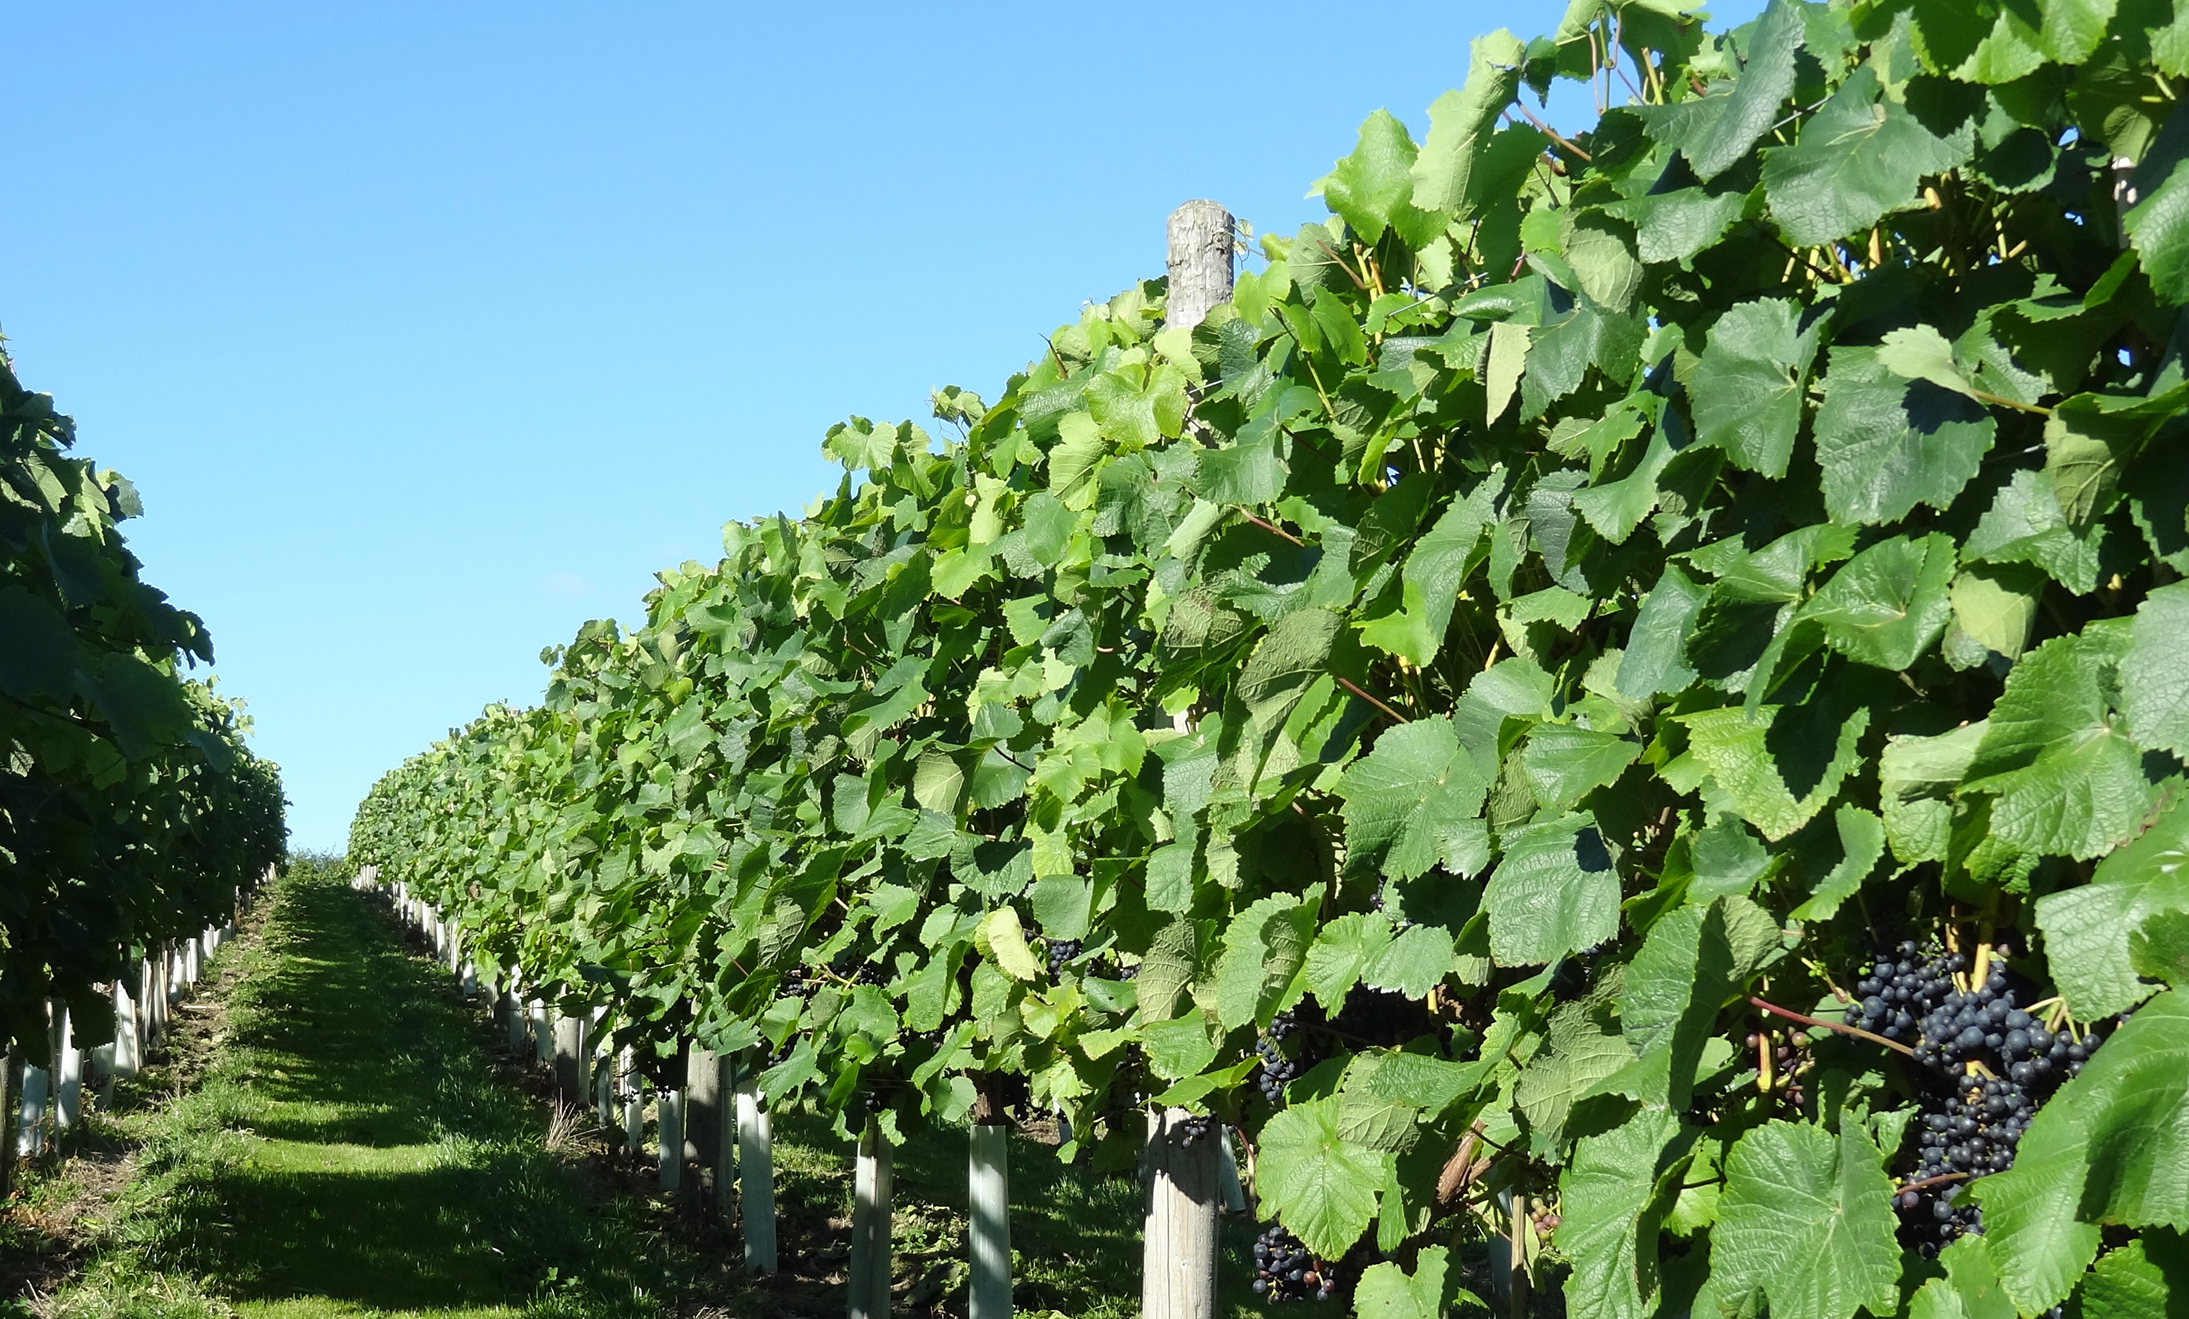 Ryedale Vineyards in North Yorkshire